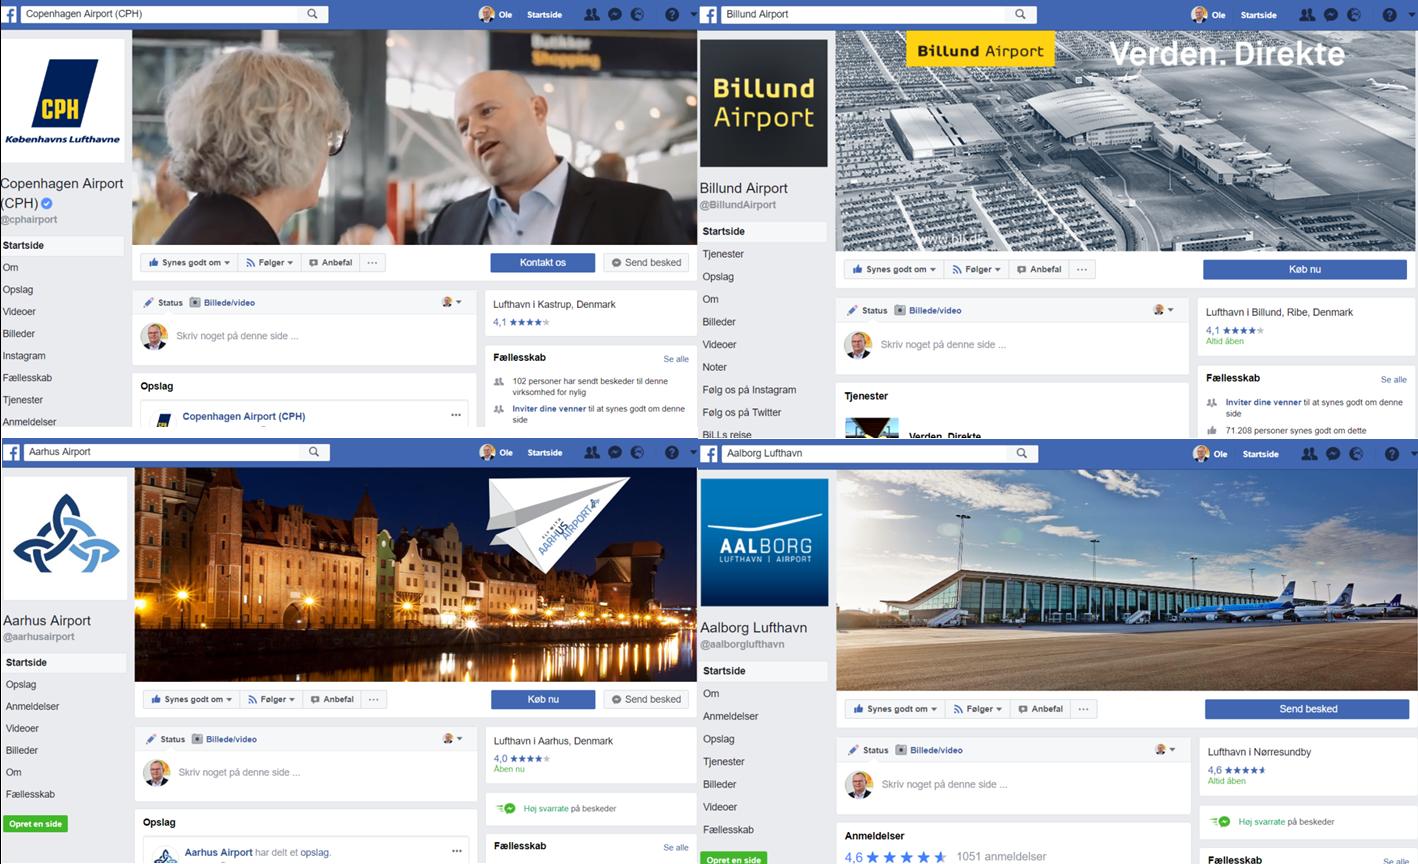 De fire største danske lufthavne på Facebook.